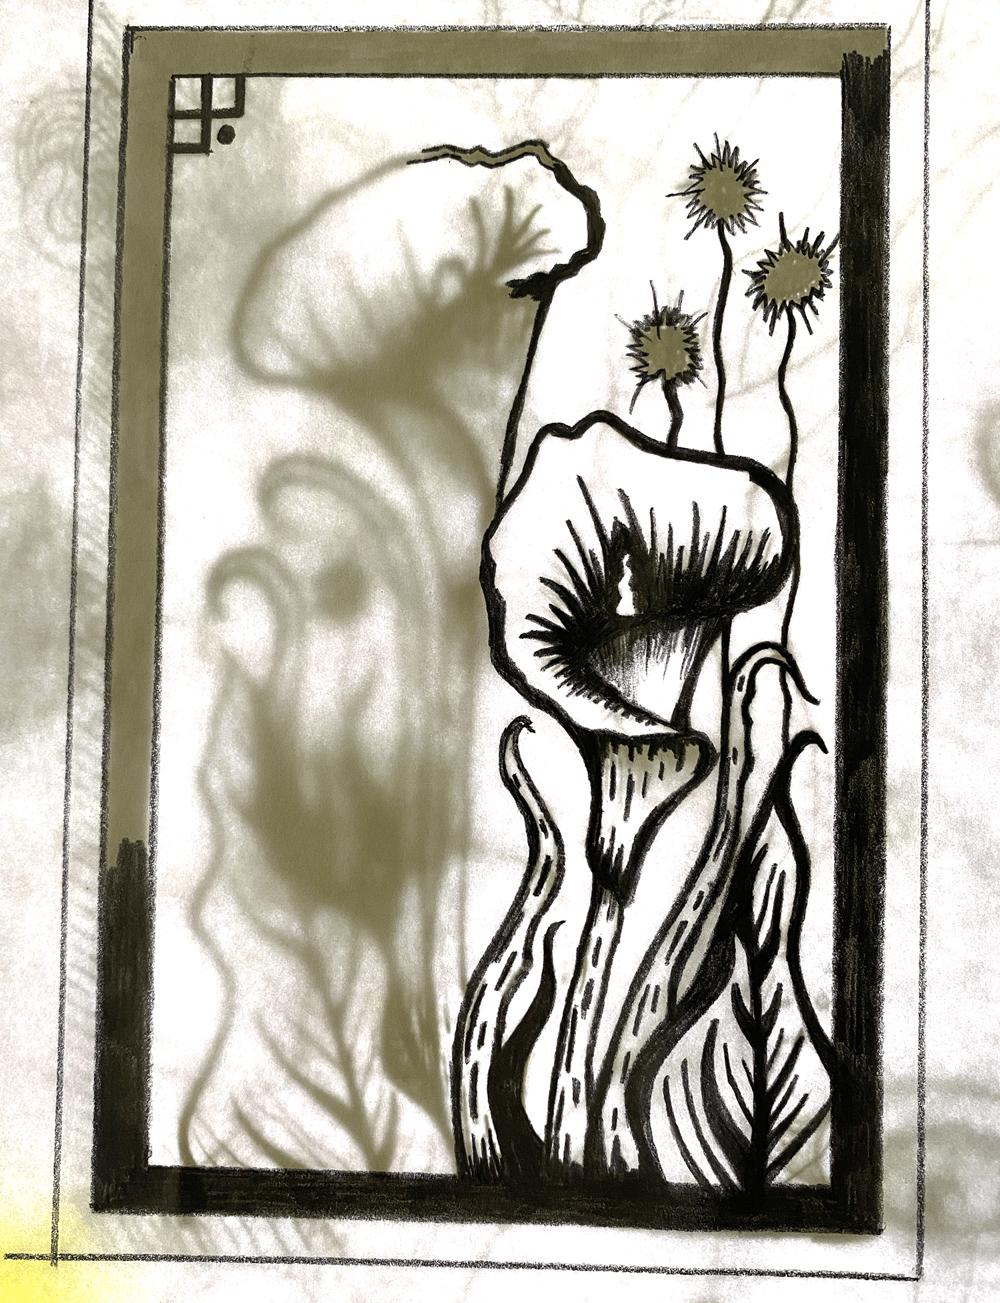 Arum Lily Linoprint - image 2 - student project